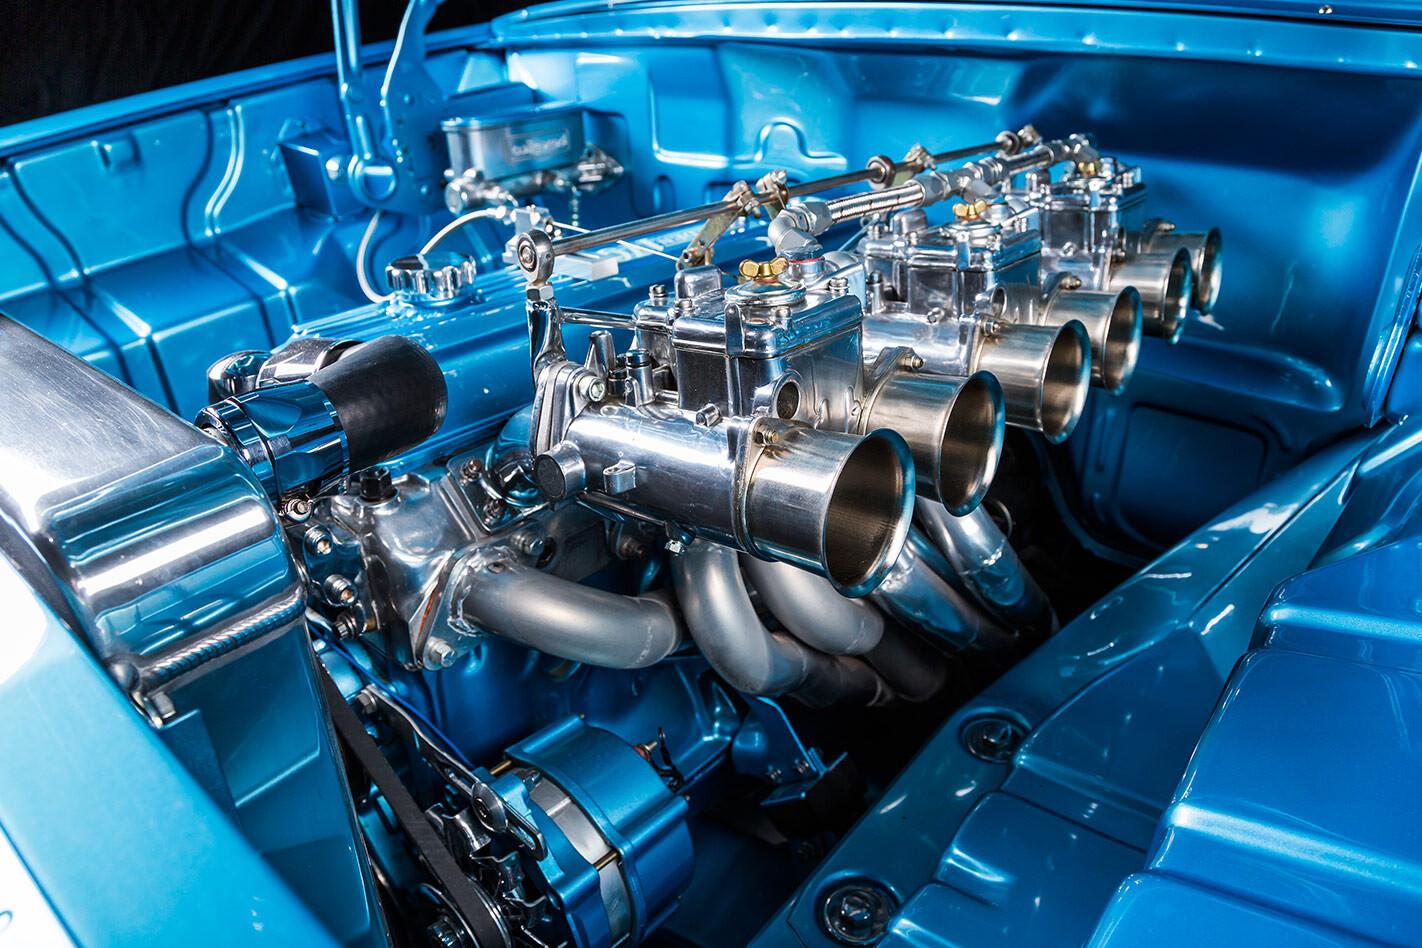 Holden EH wagon engine